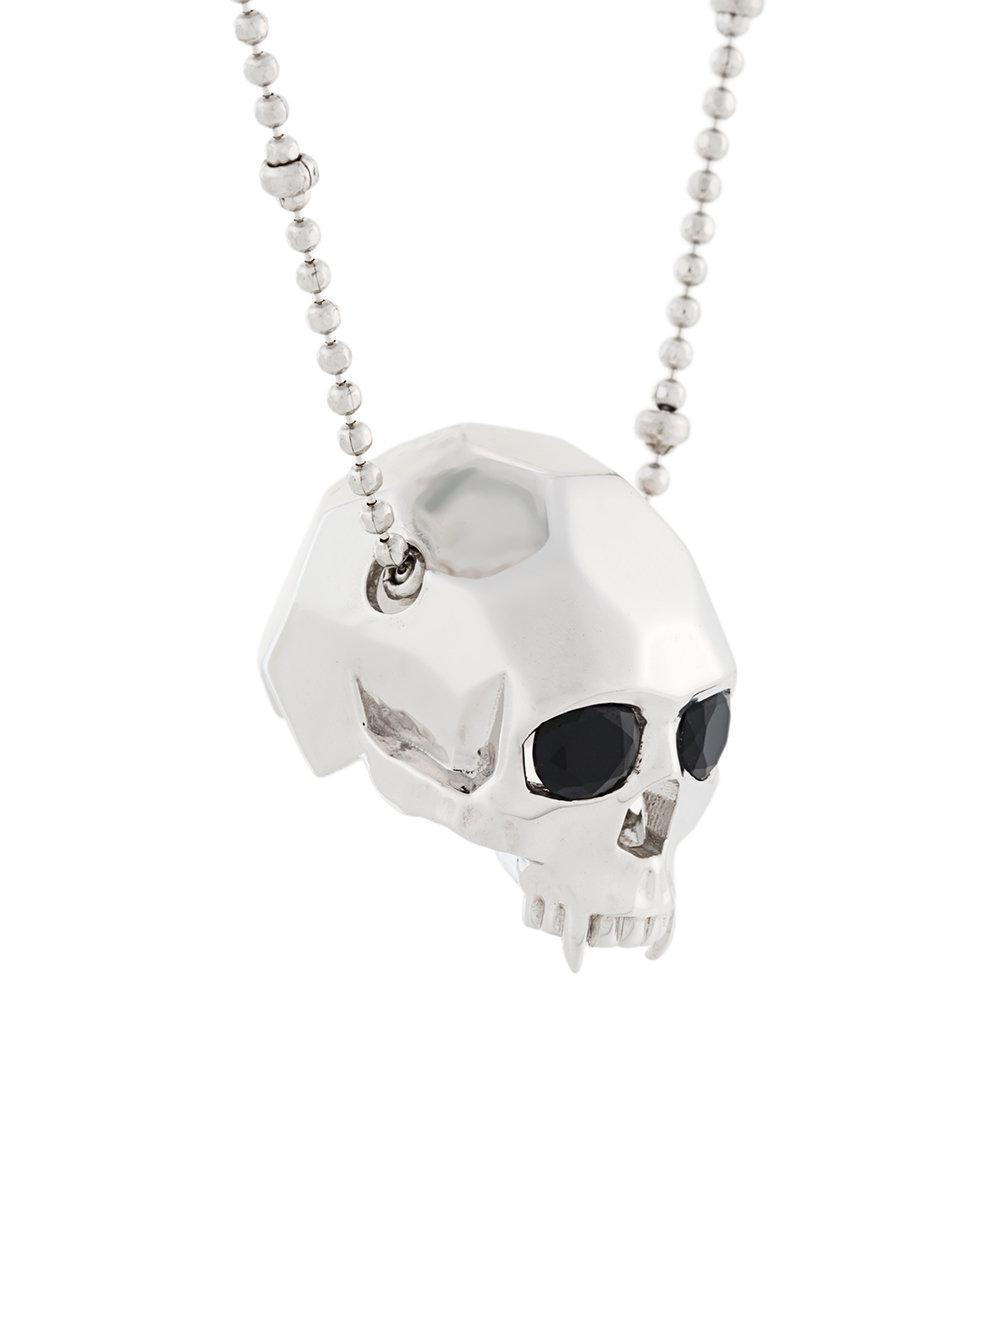 vampire skull pendant necklace - Metallic Kasun London jtiuWzjBvf